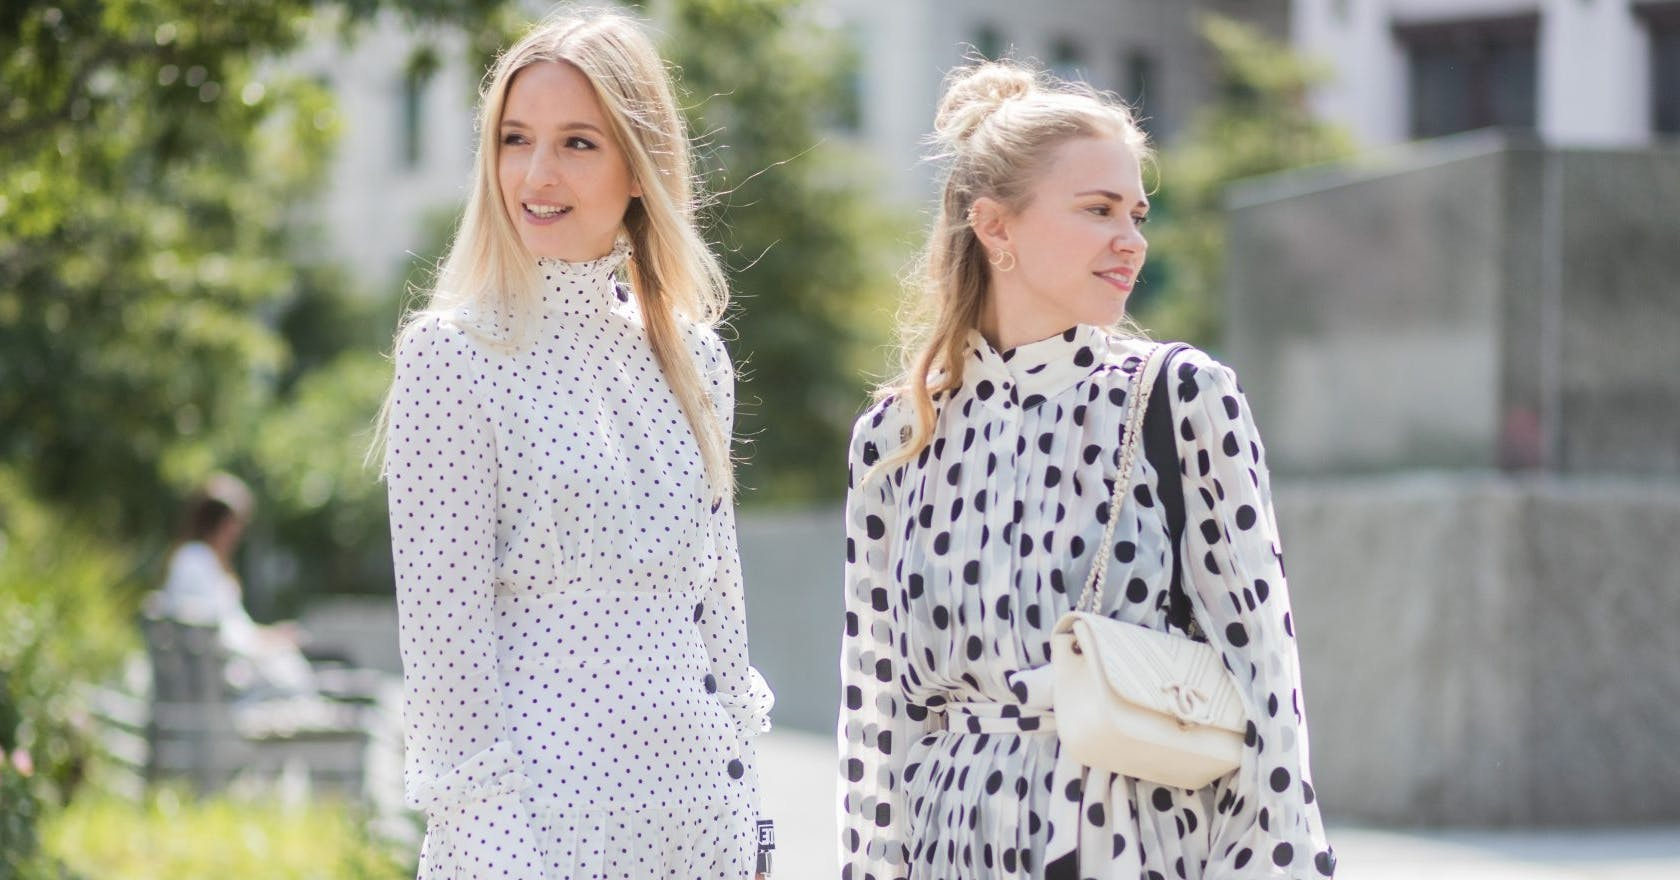 Shop Polka Dot Dress Alternatives To That Zara White